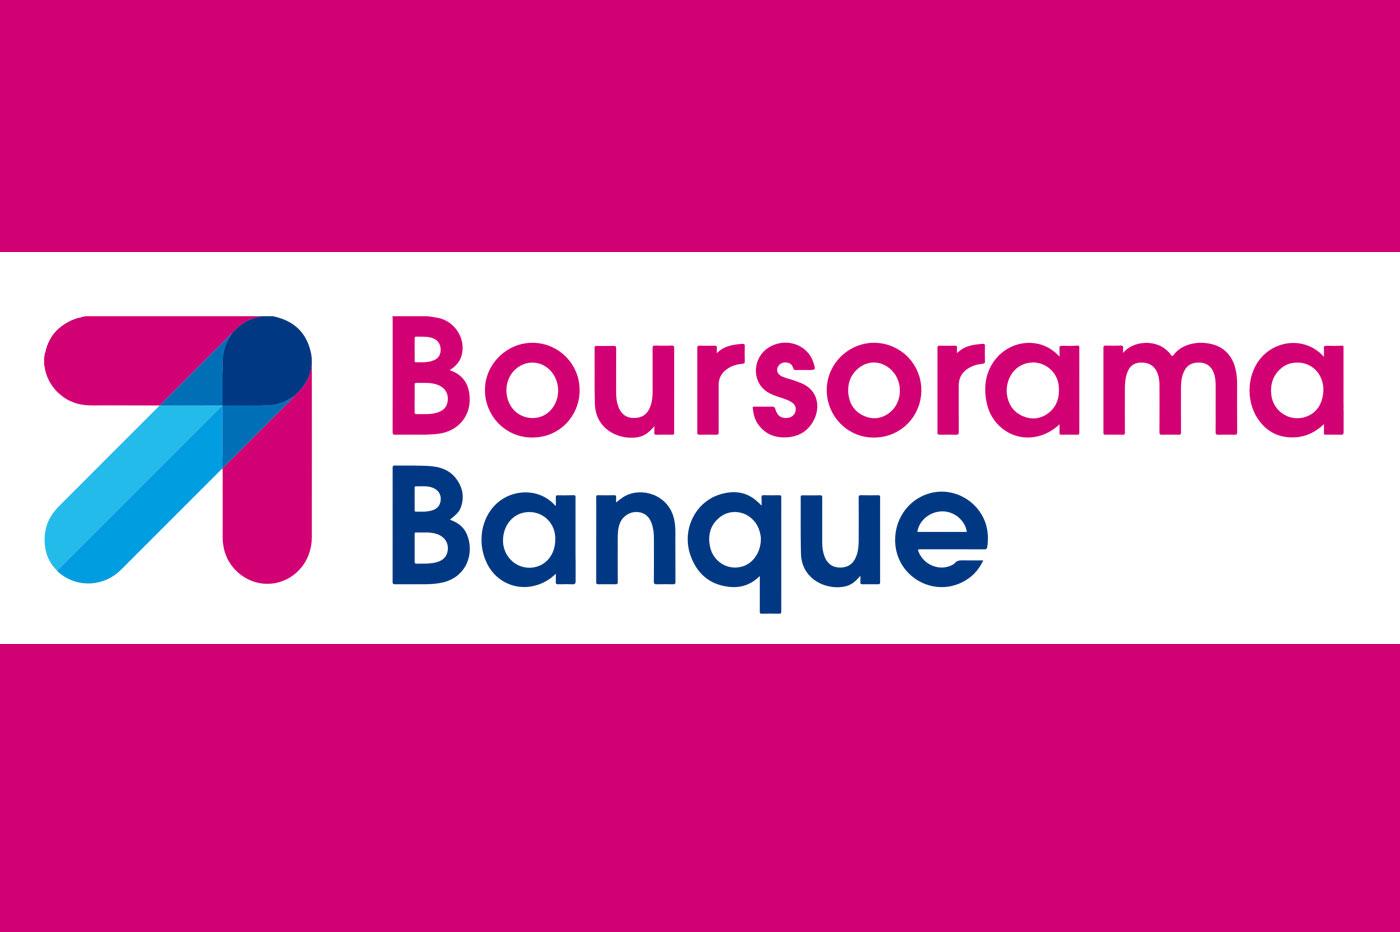 Comment contacter Boursorama Banque?